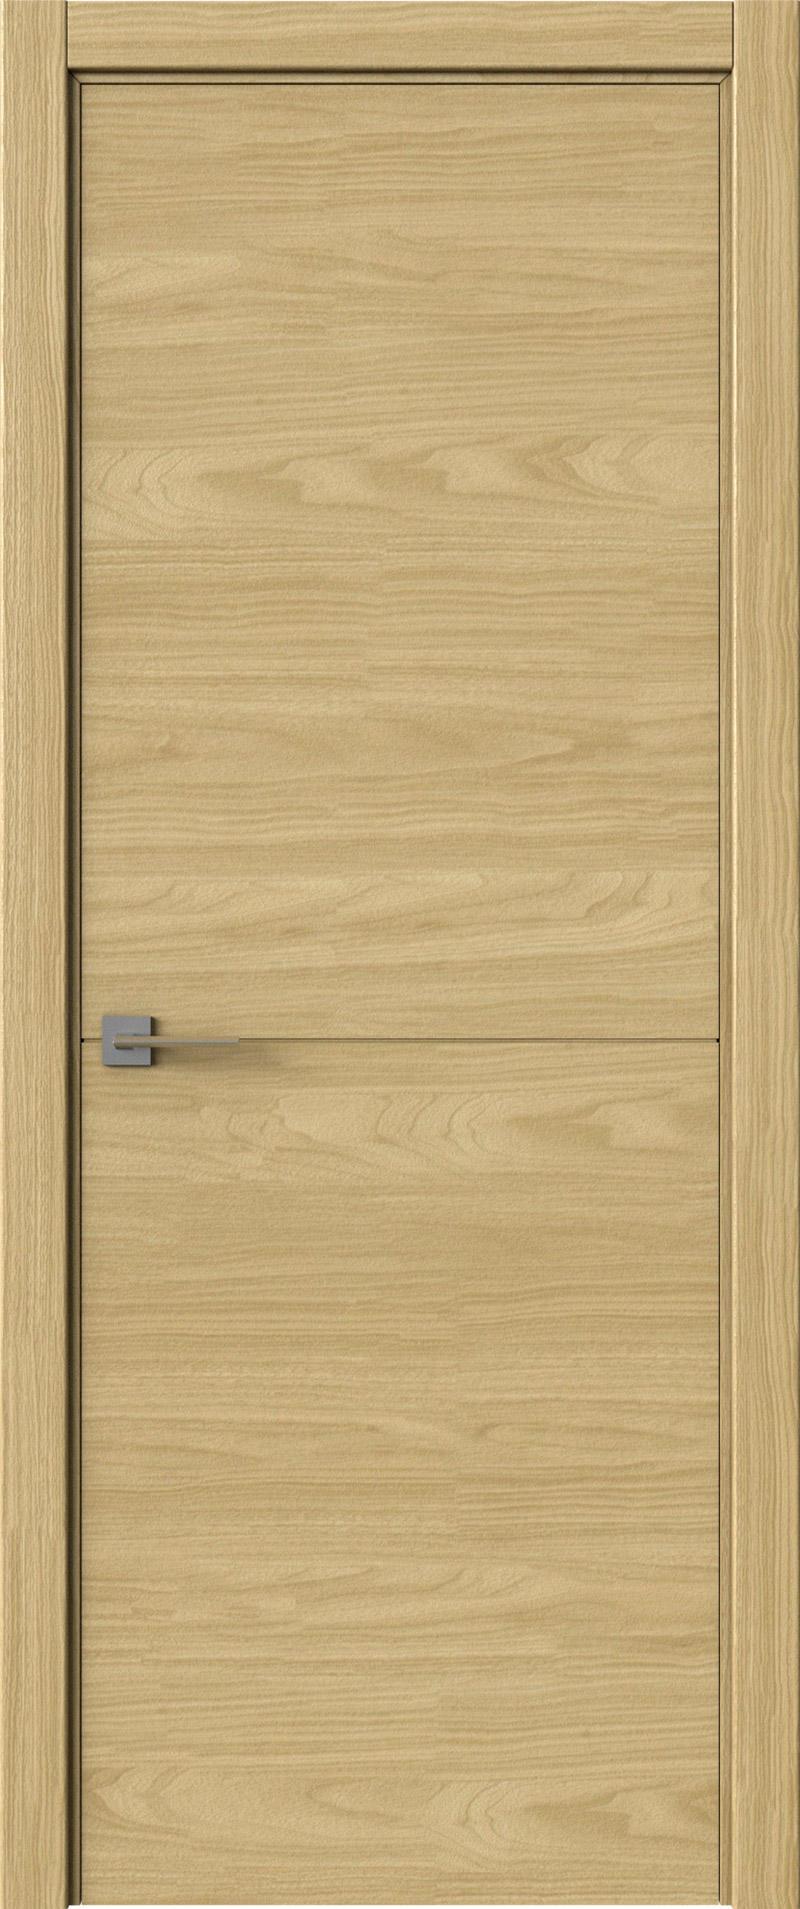 Tivoli Б-2 цвет - Дуб нордик Без стекла (ДГ)